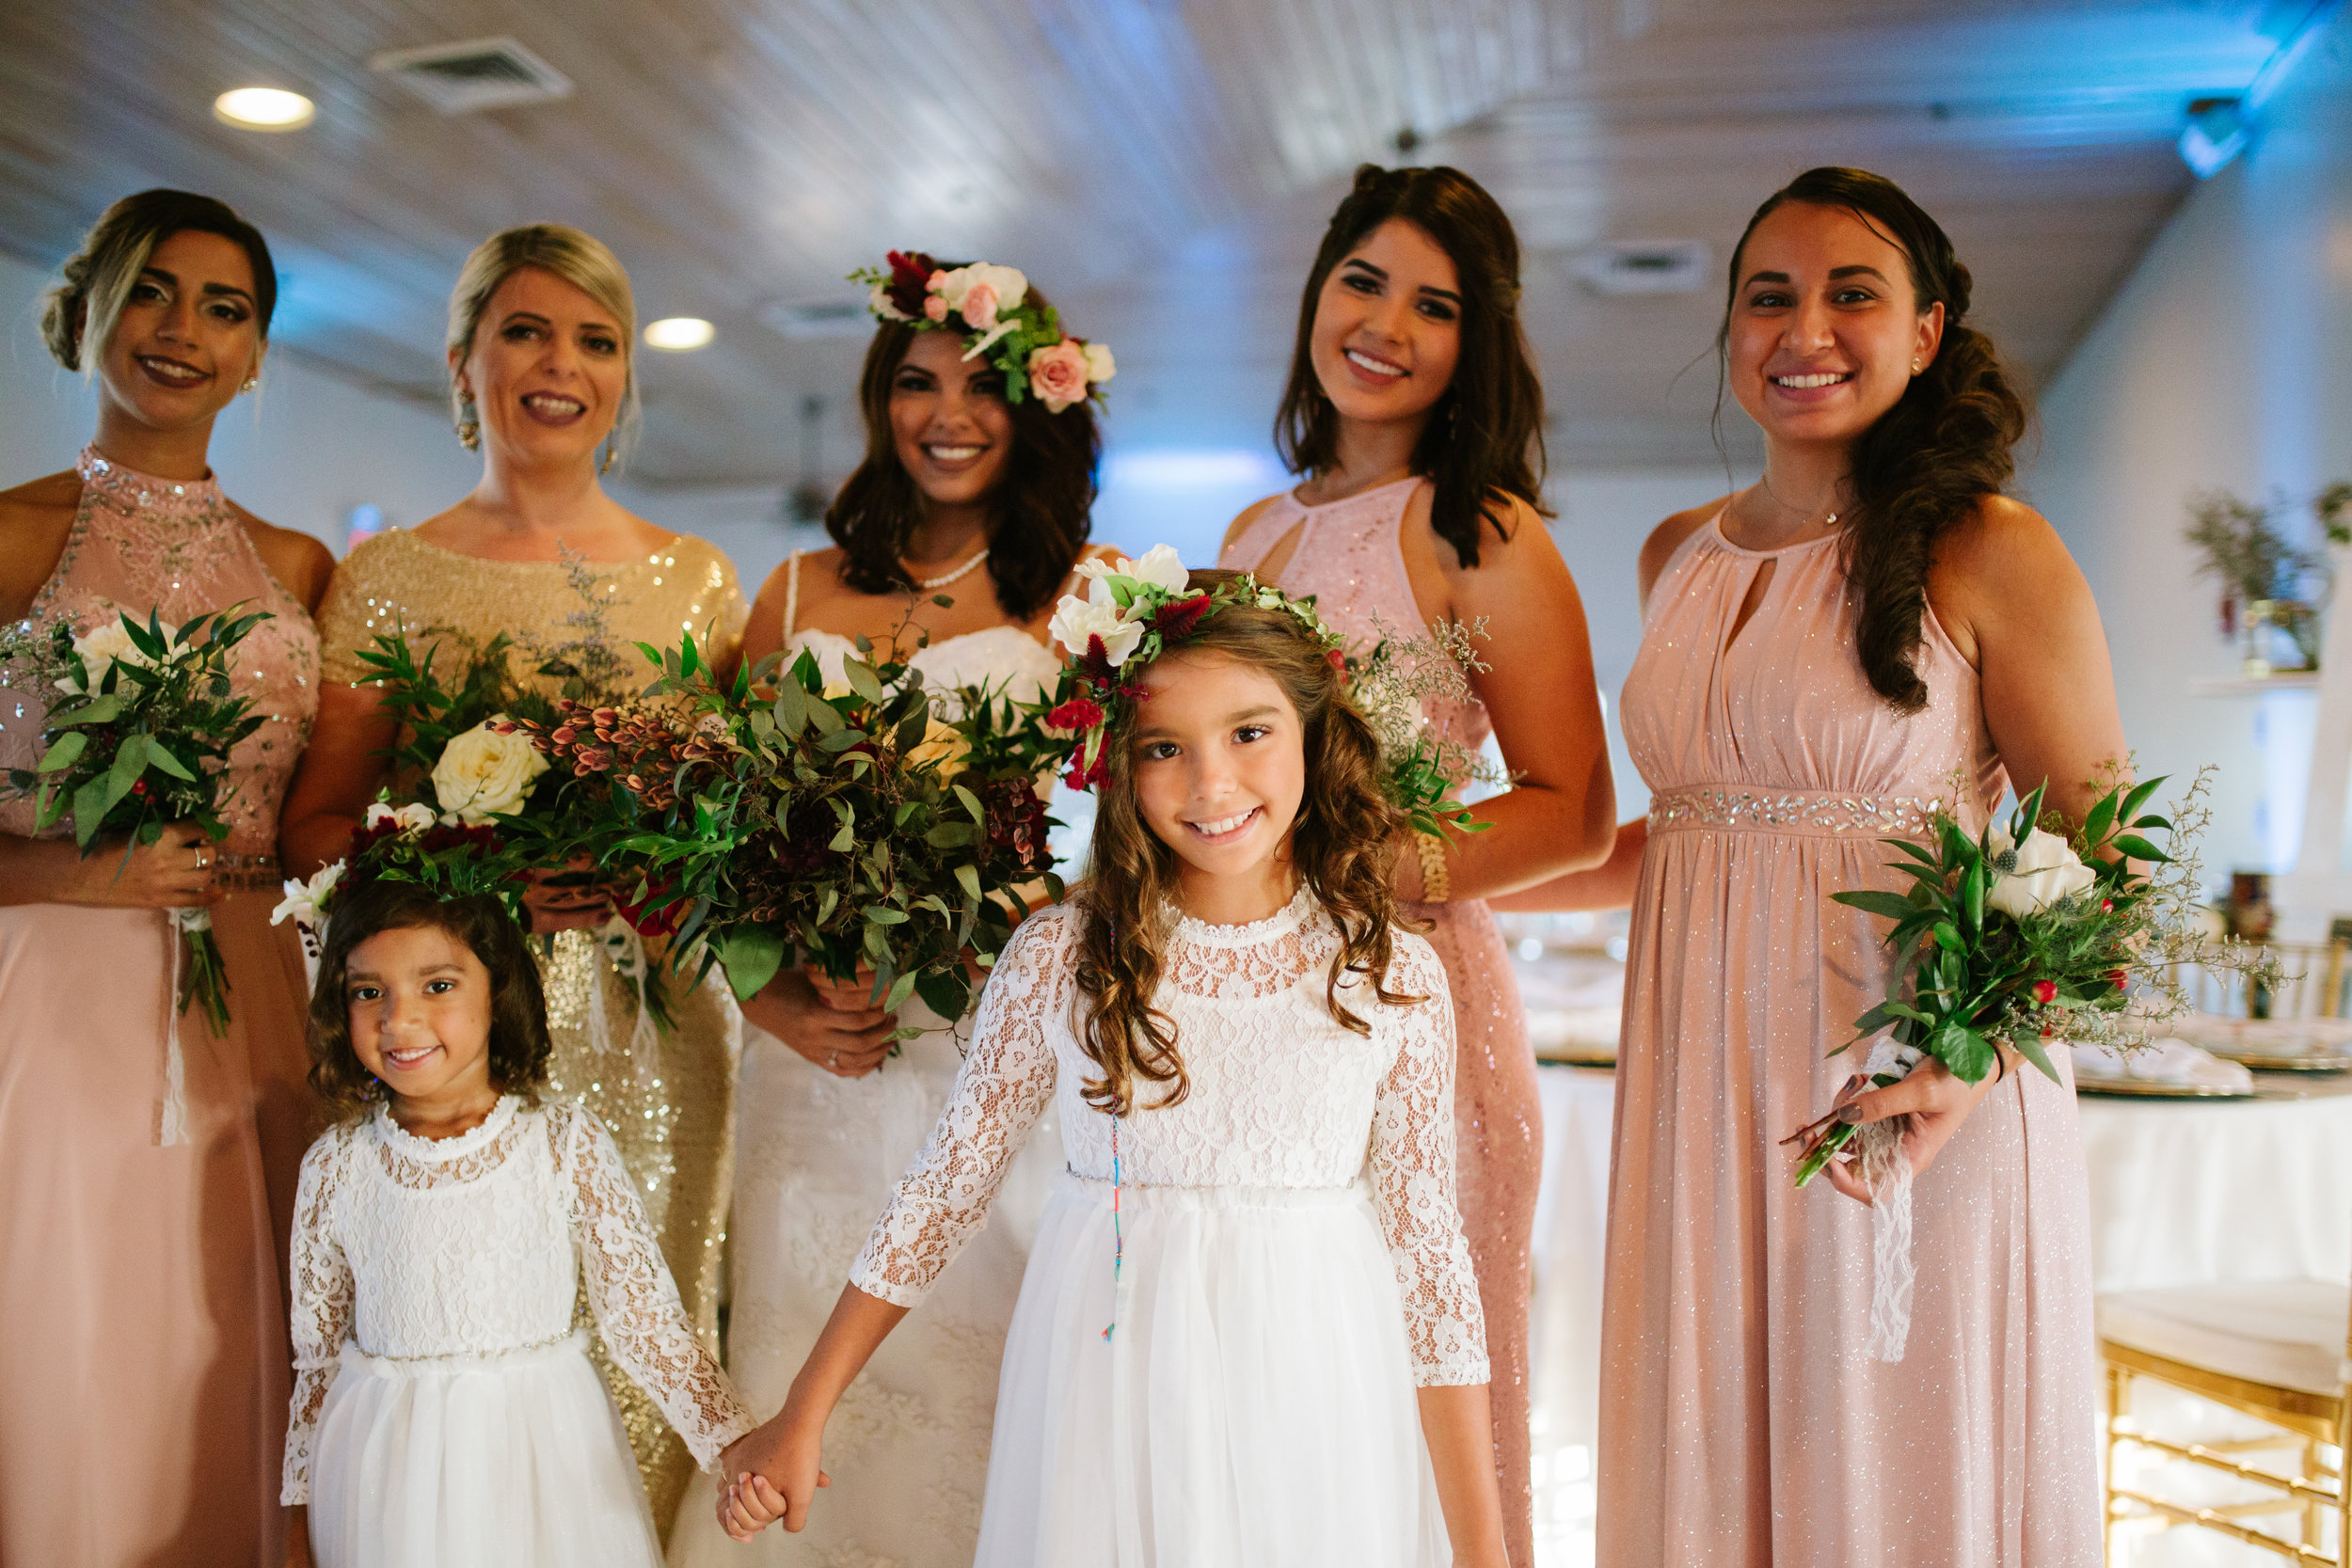 2017.05.23 Barbara and Mauricio Sales Port St Lucie Wedding (271 of 772).jpg